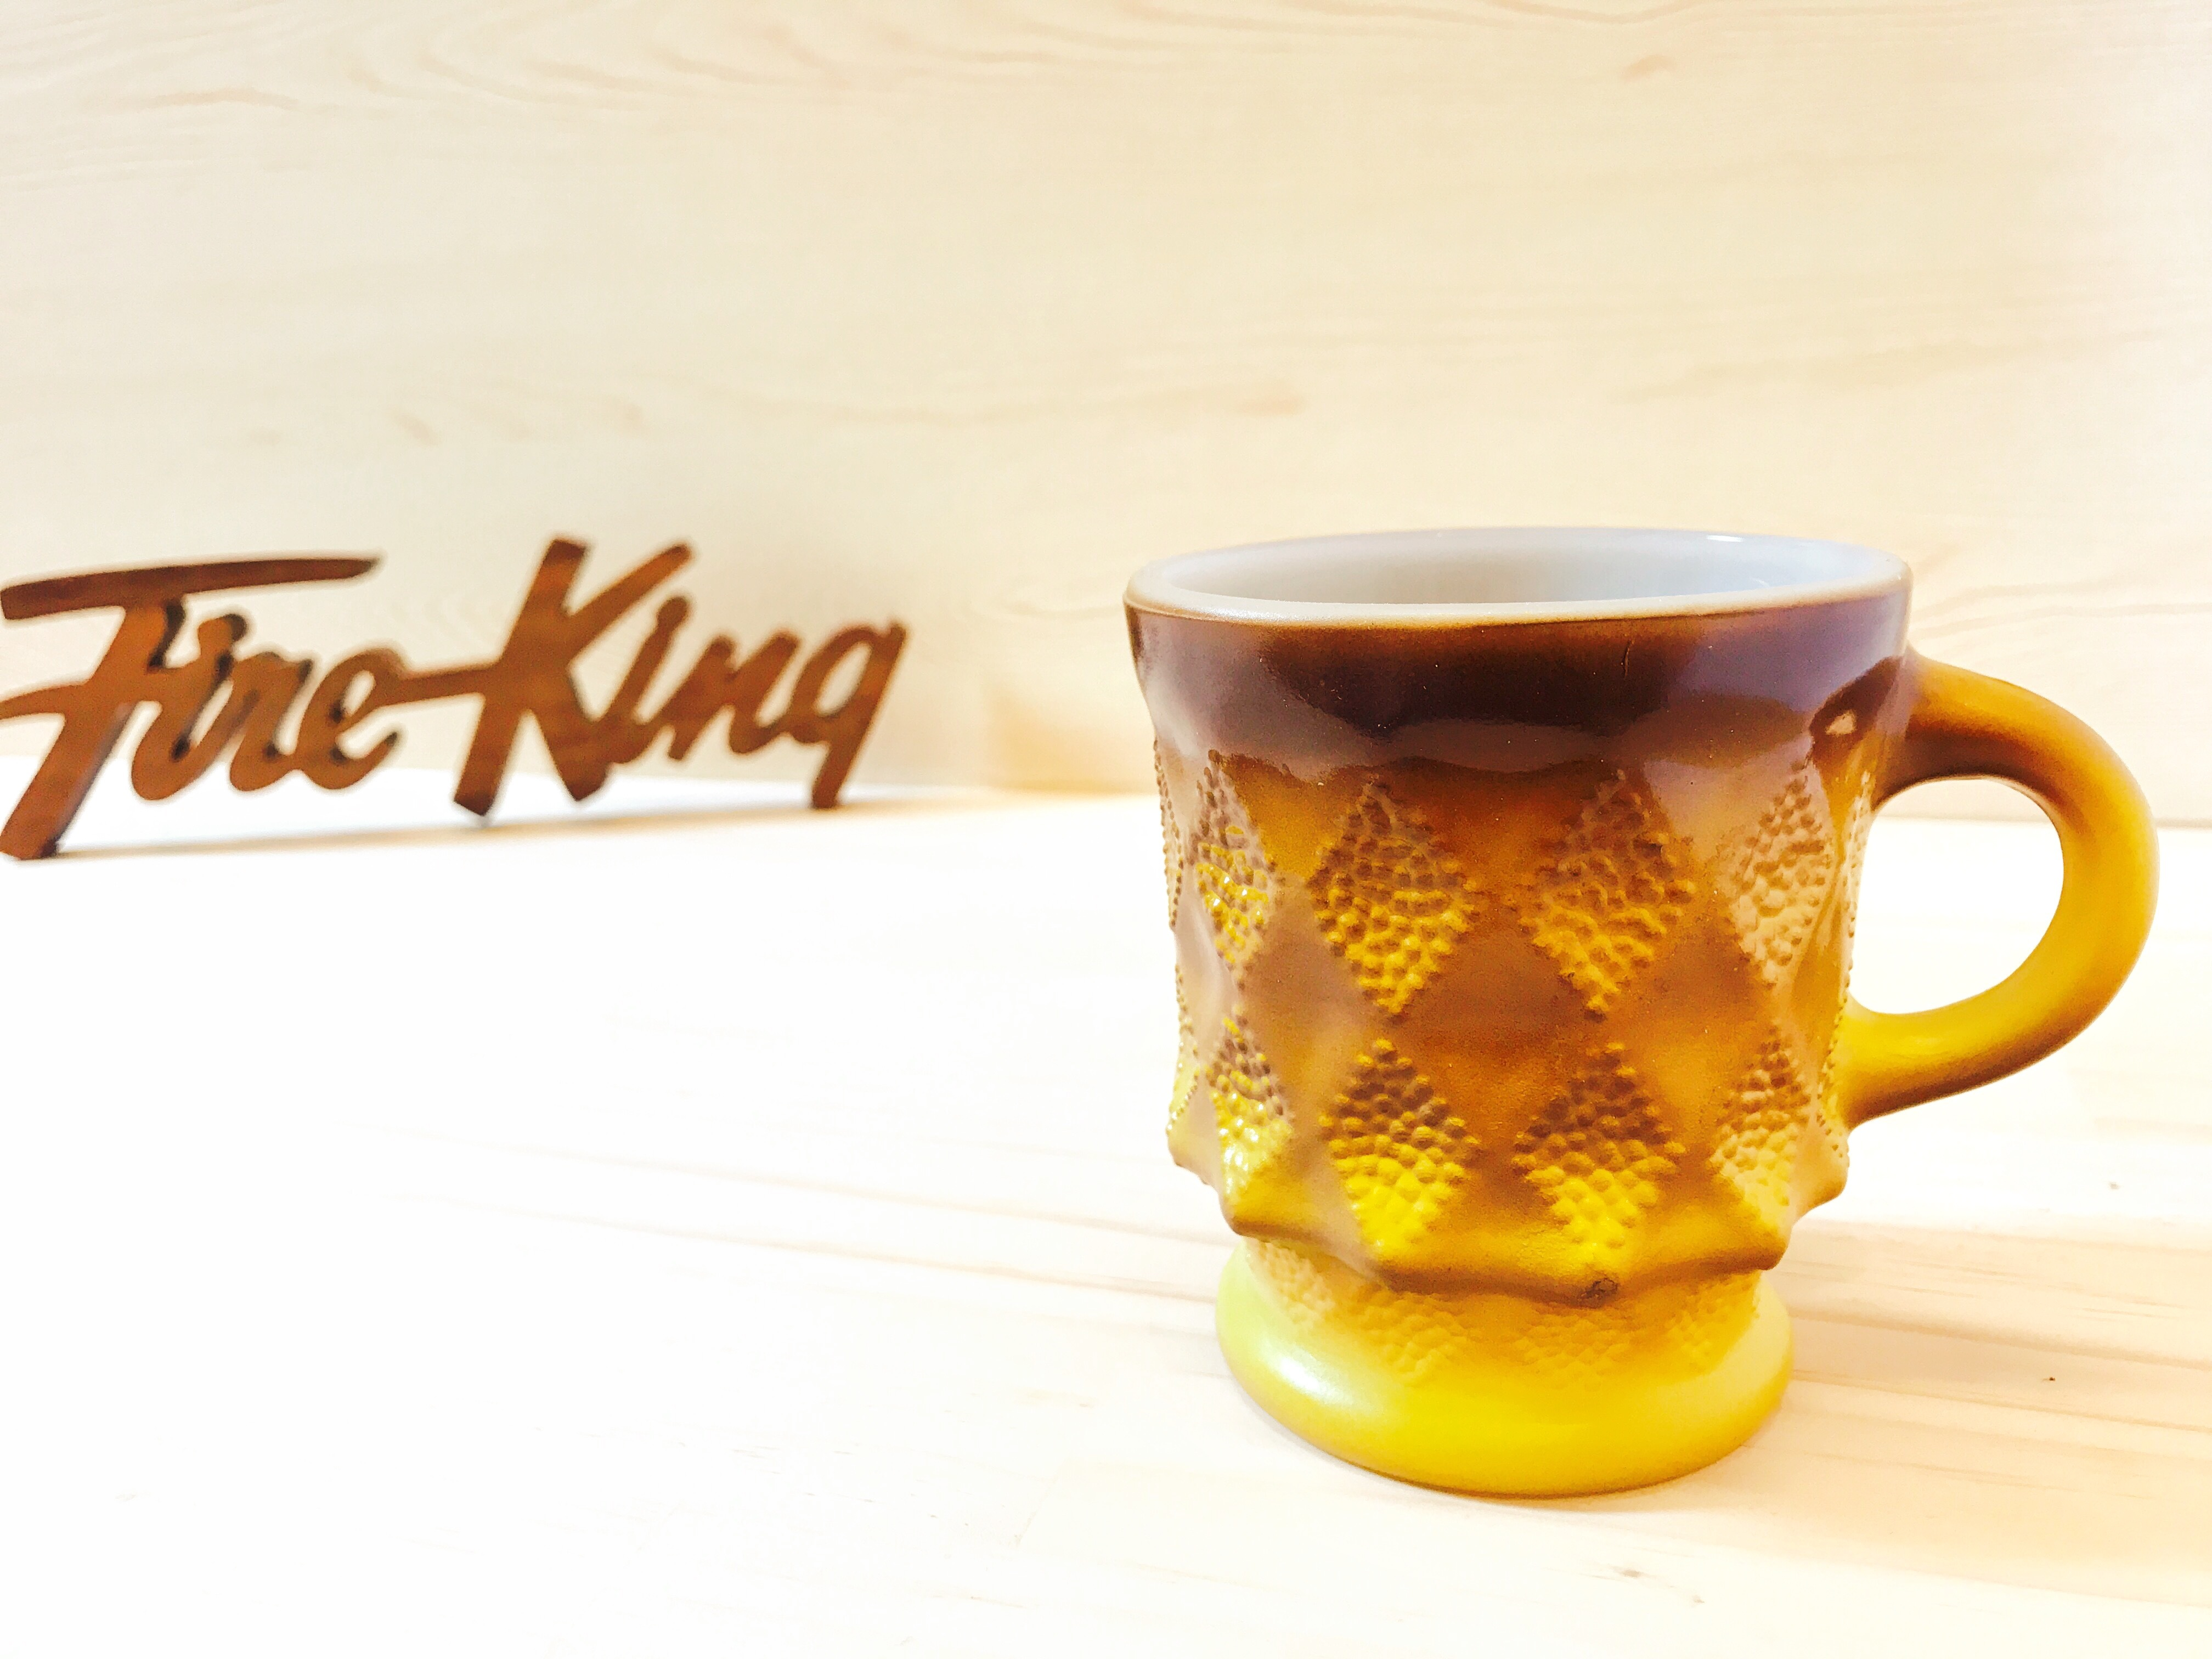 "[Fire King] ダイヤモンドマグ ""キンバリー"" ブラウン・イエロー ミルクガラス (識別No.23001)"